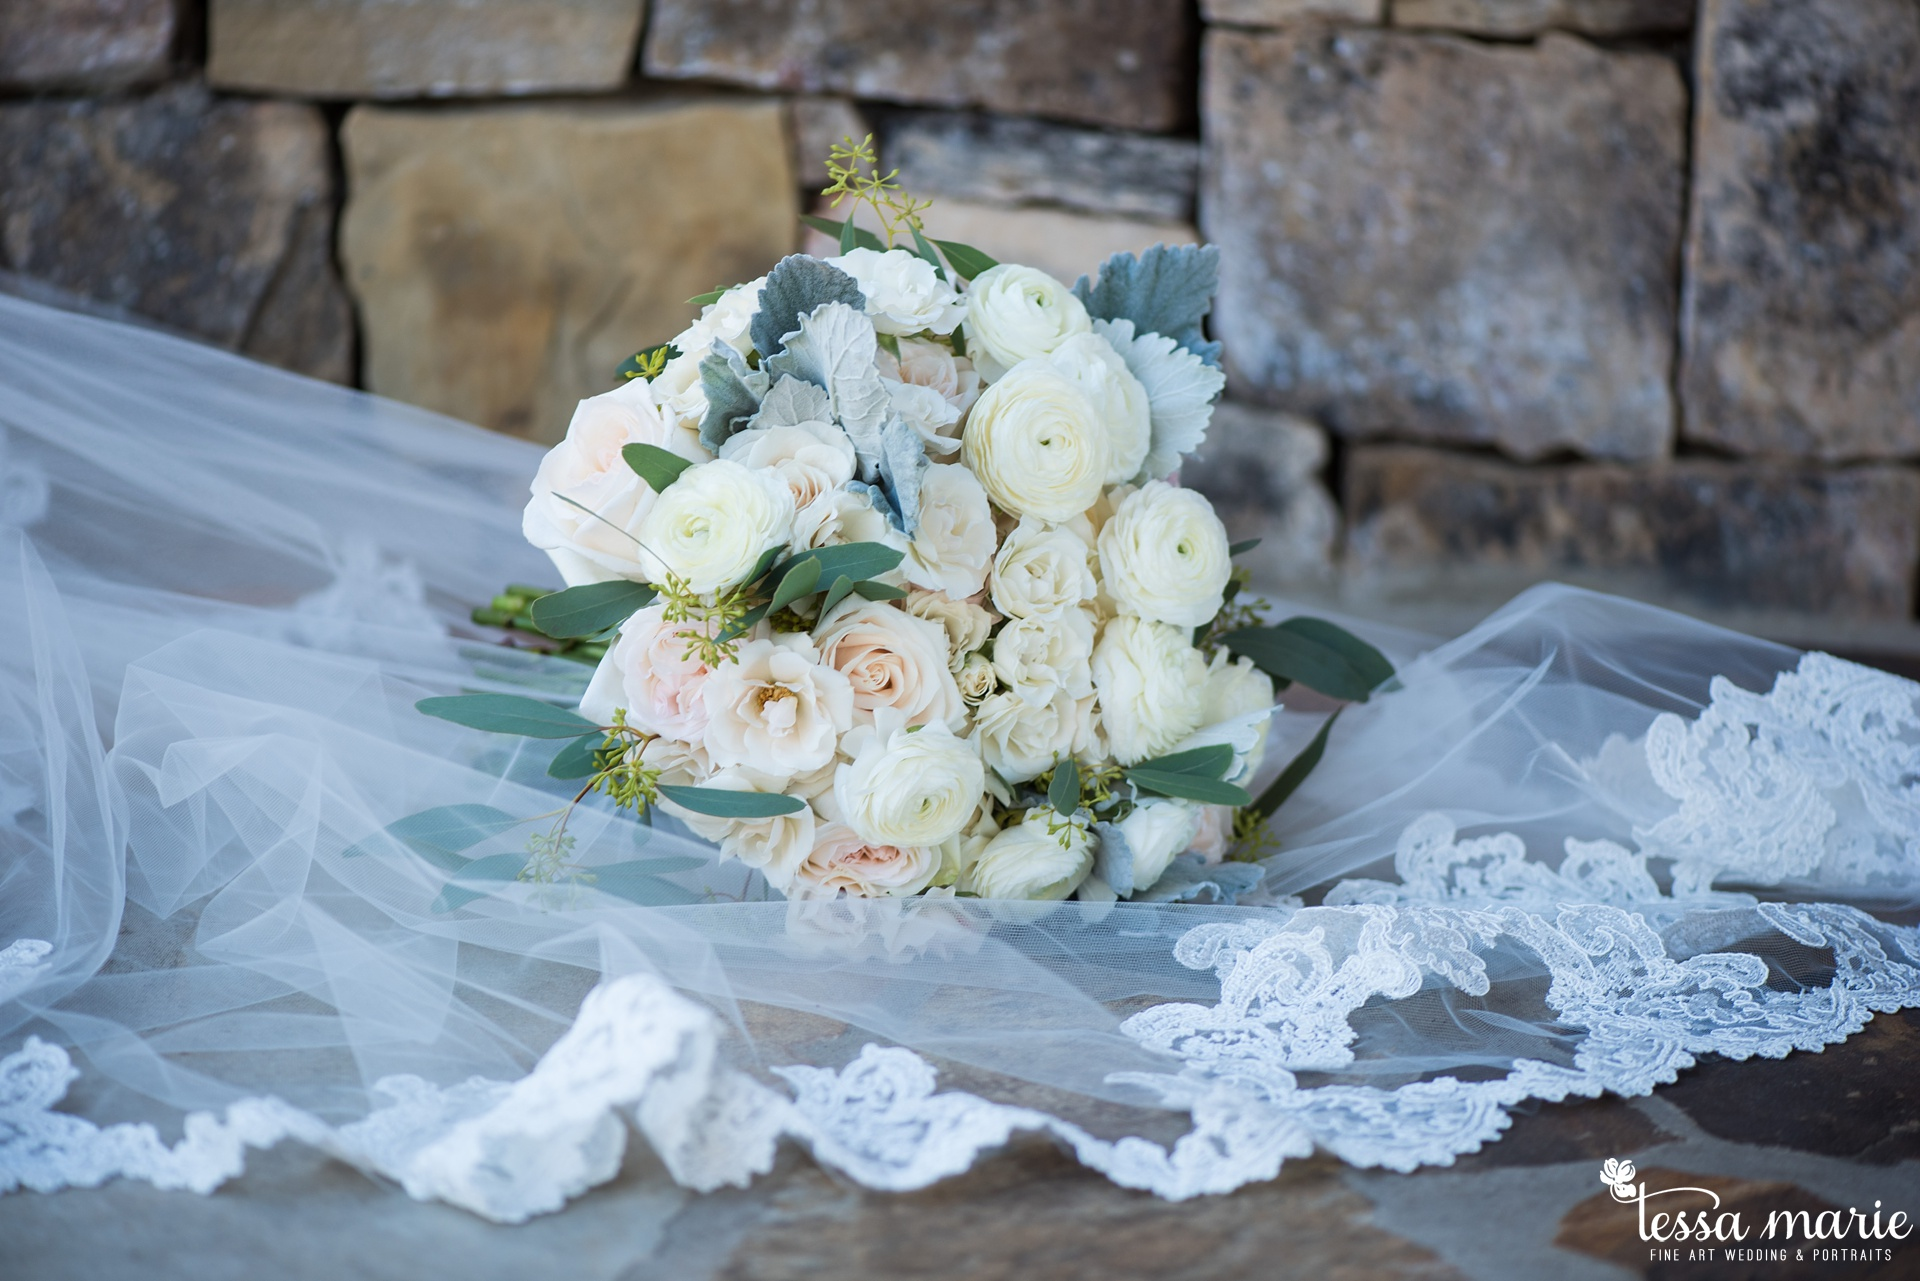 tessa_marie_legacy_moments_storytelling_candid_emotionally_driven_wedding_photographer_atlanta_wedding_photography_st_ives_country_club_wedding_boukates_bridals_by_lori_0001